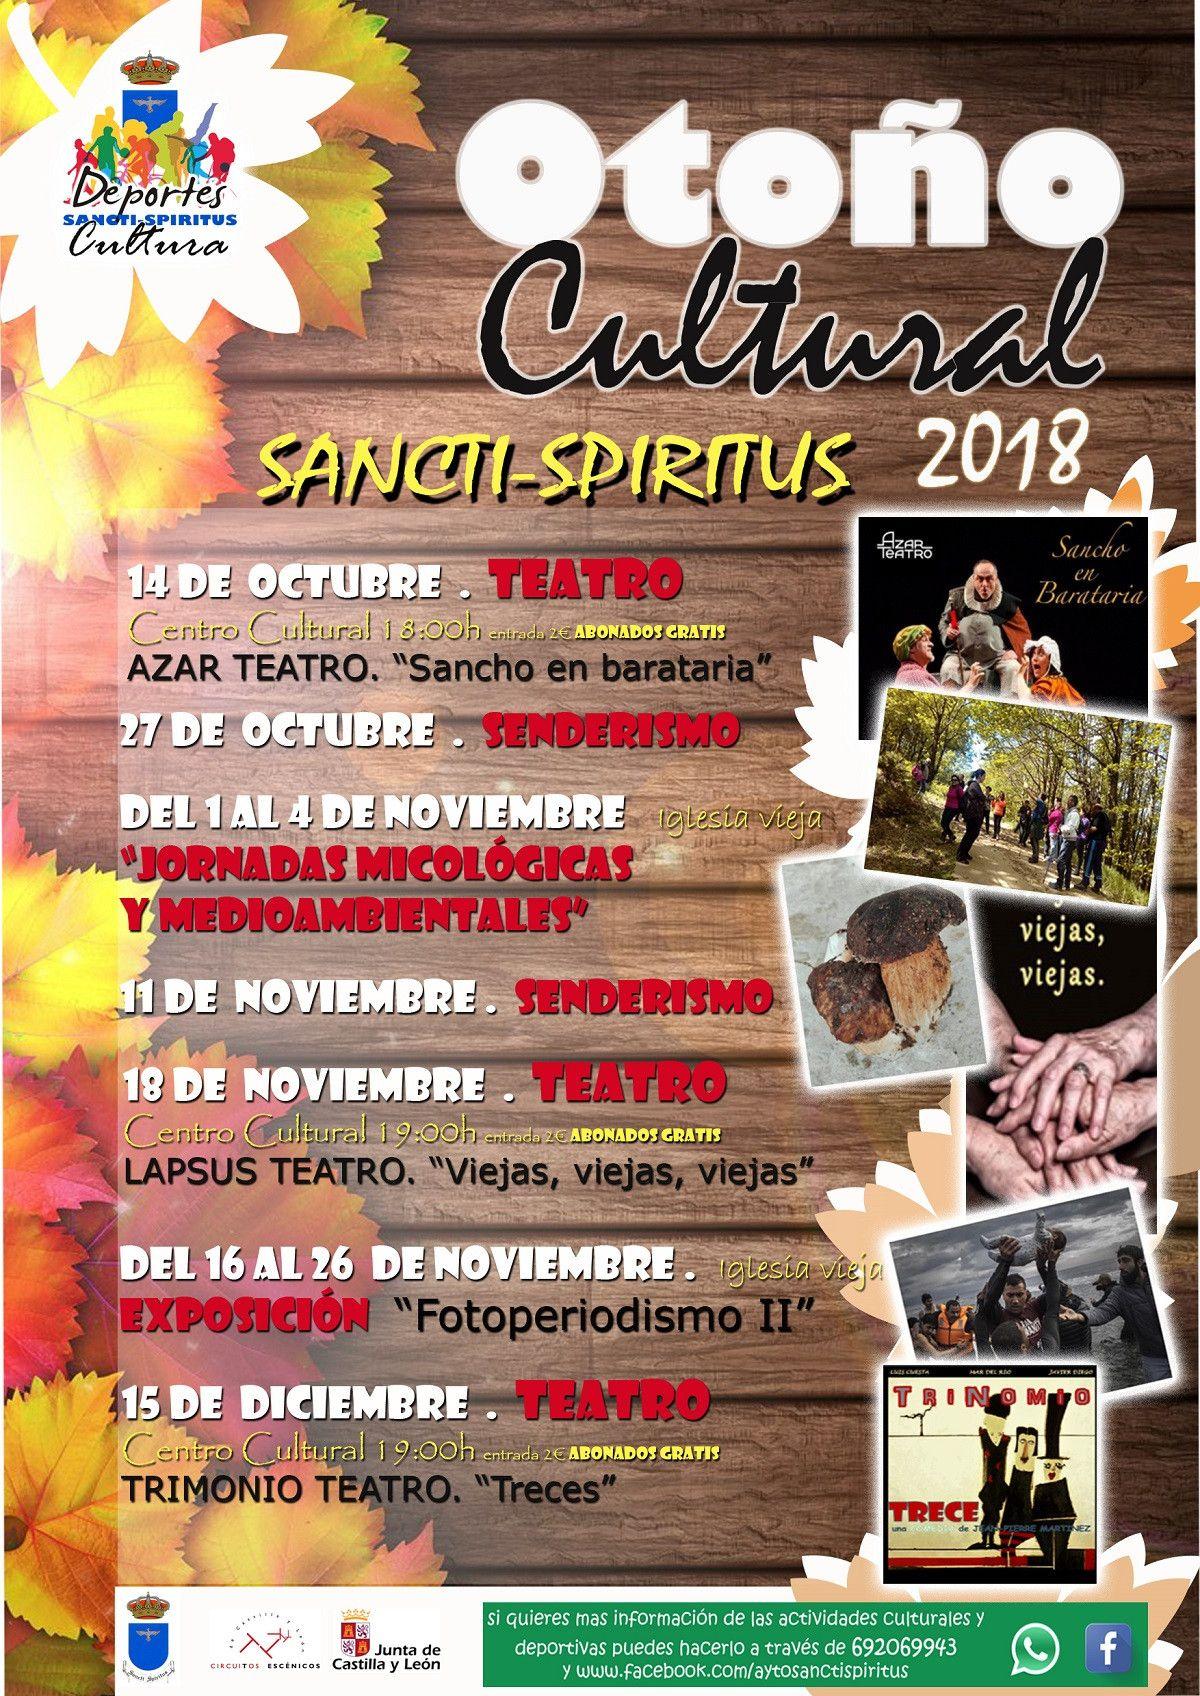 Sancti Spiritus otou00f1o cultural